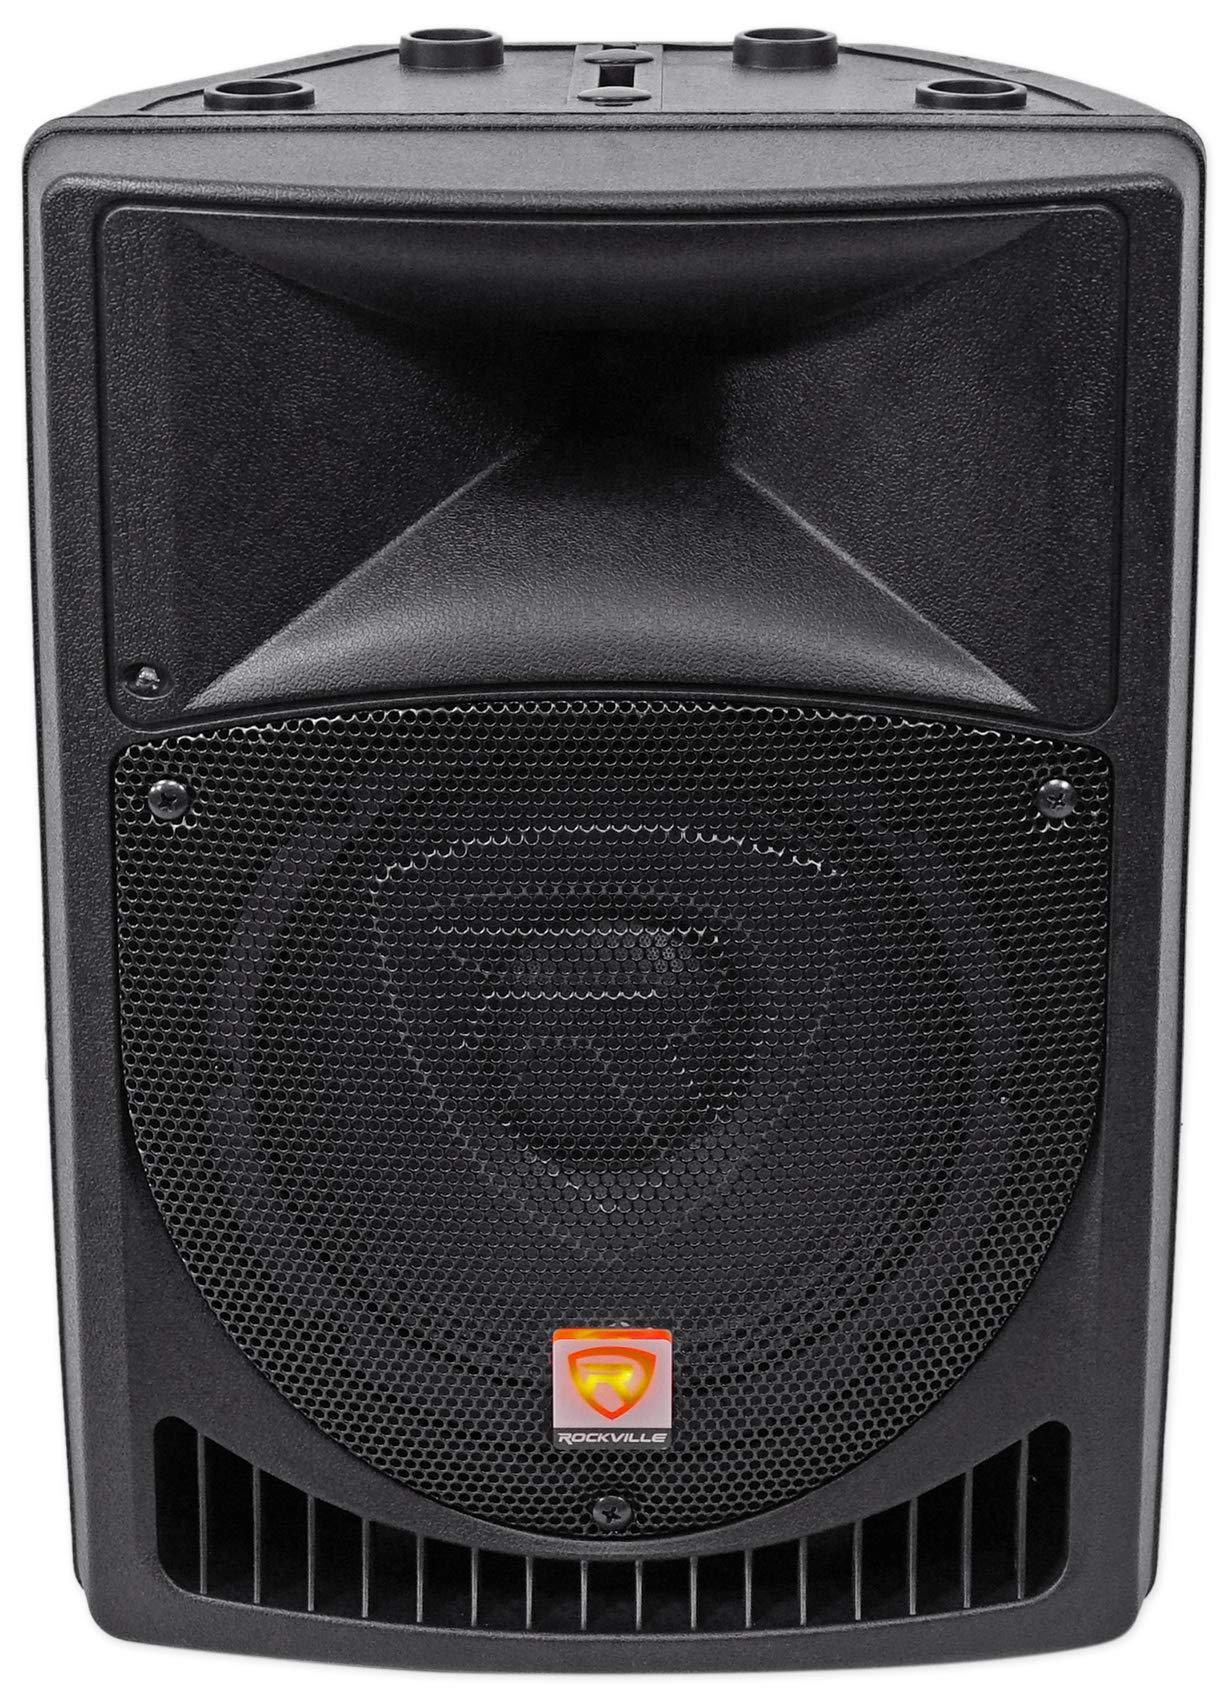 Rockville RPG8 8'' Powered Active 400 Watt 2-Way DJ PA Speaker System by Rockville